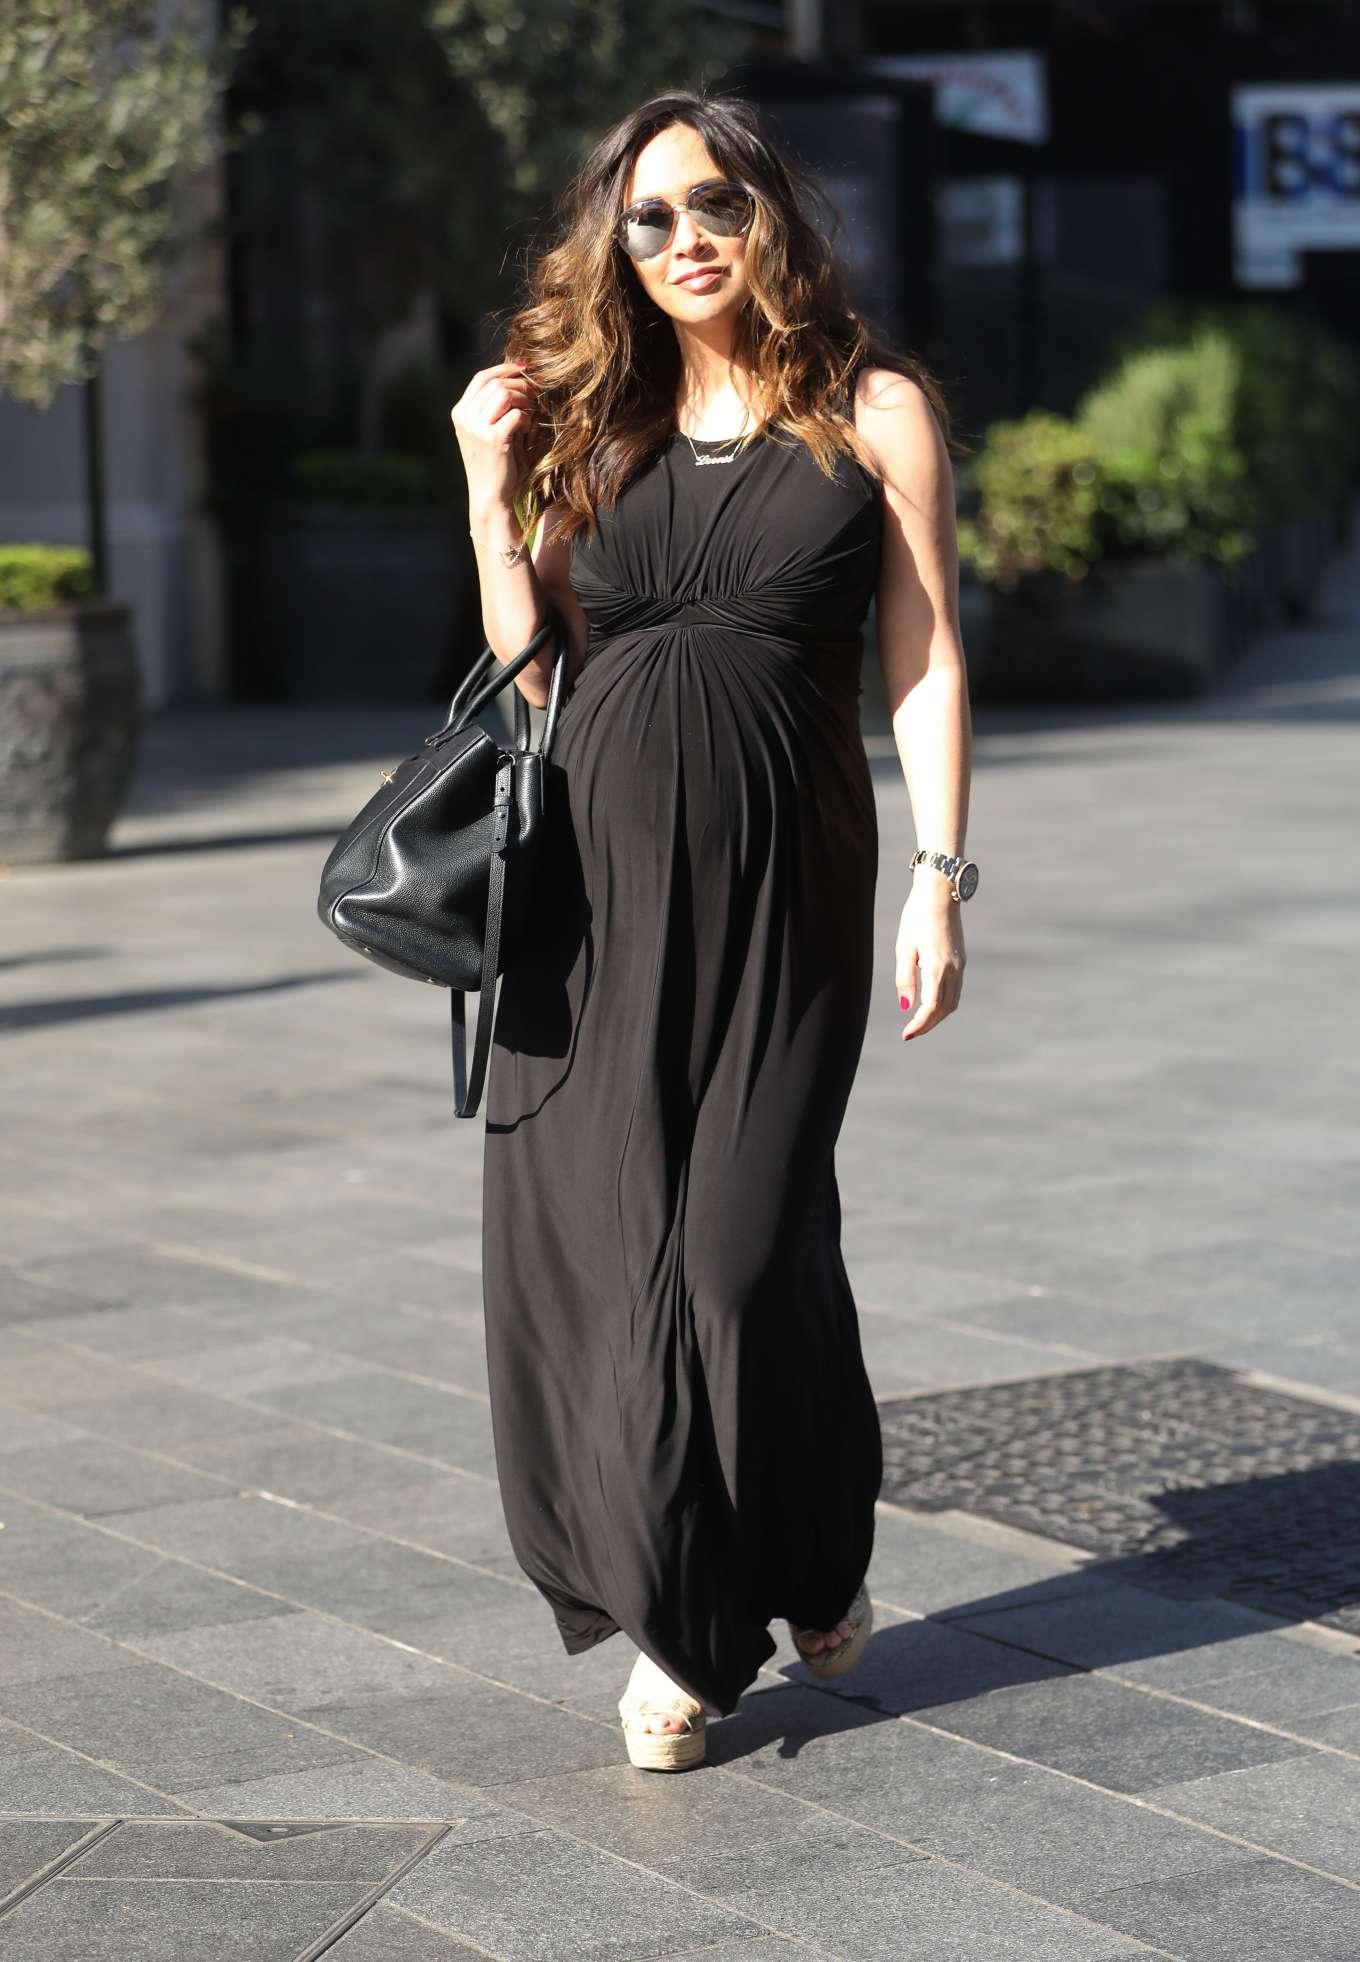 Myleene Klass 2019 : Myleene Klass: In classic black maternity dress arriving at Global Radio in London-01